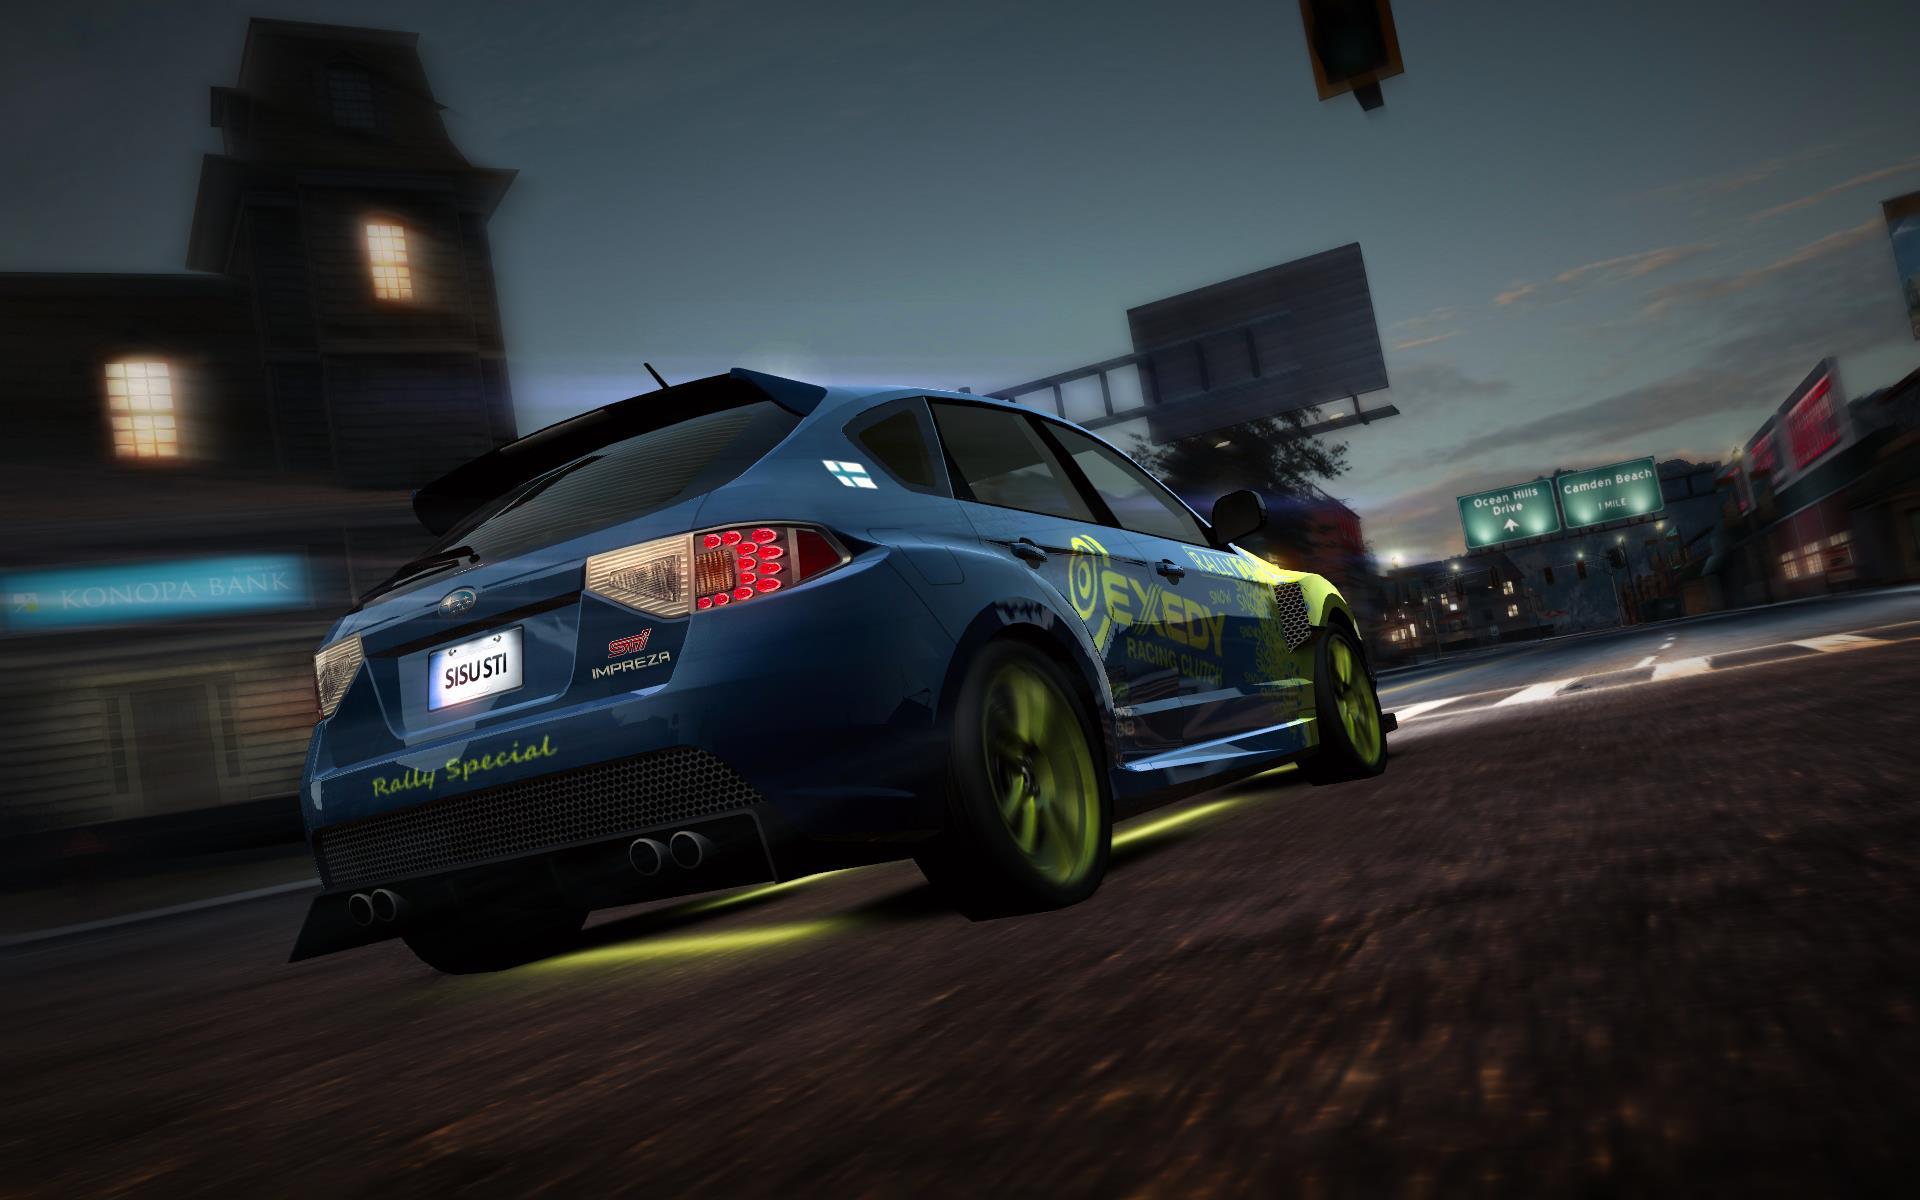 Image Carrelease Subaru Impreza Wrx Sti Hatchback All